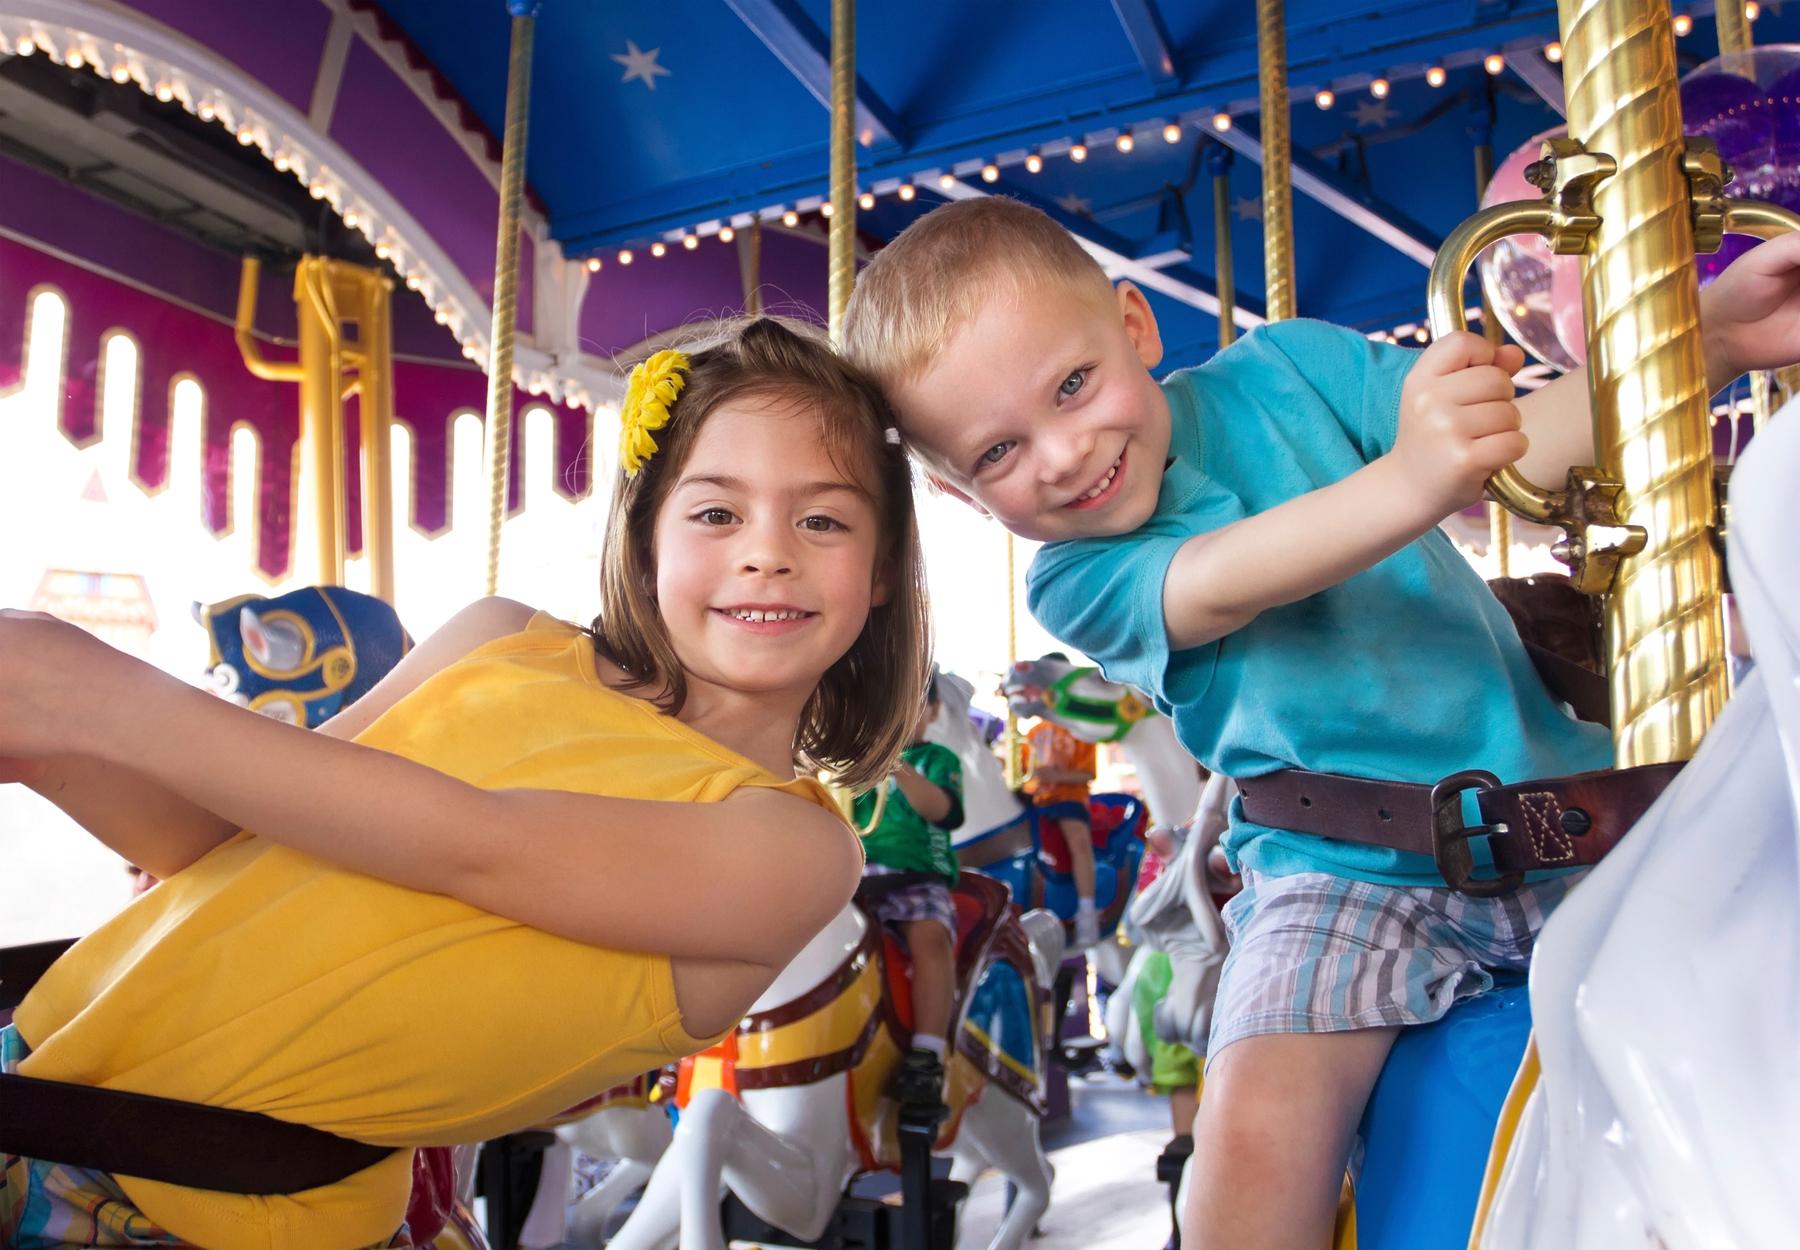 Familienurlaub im Disneyland